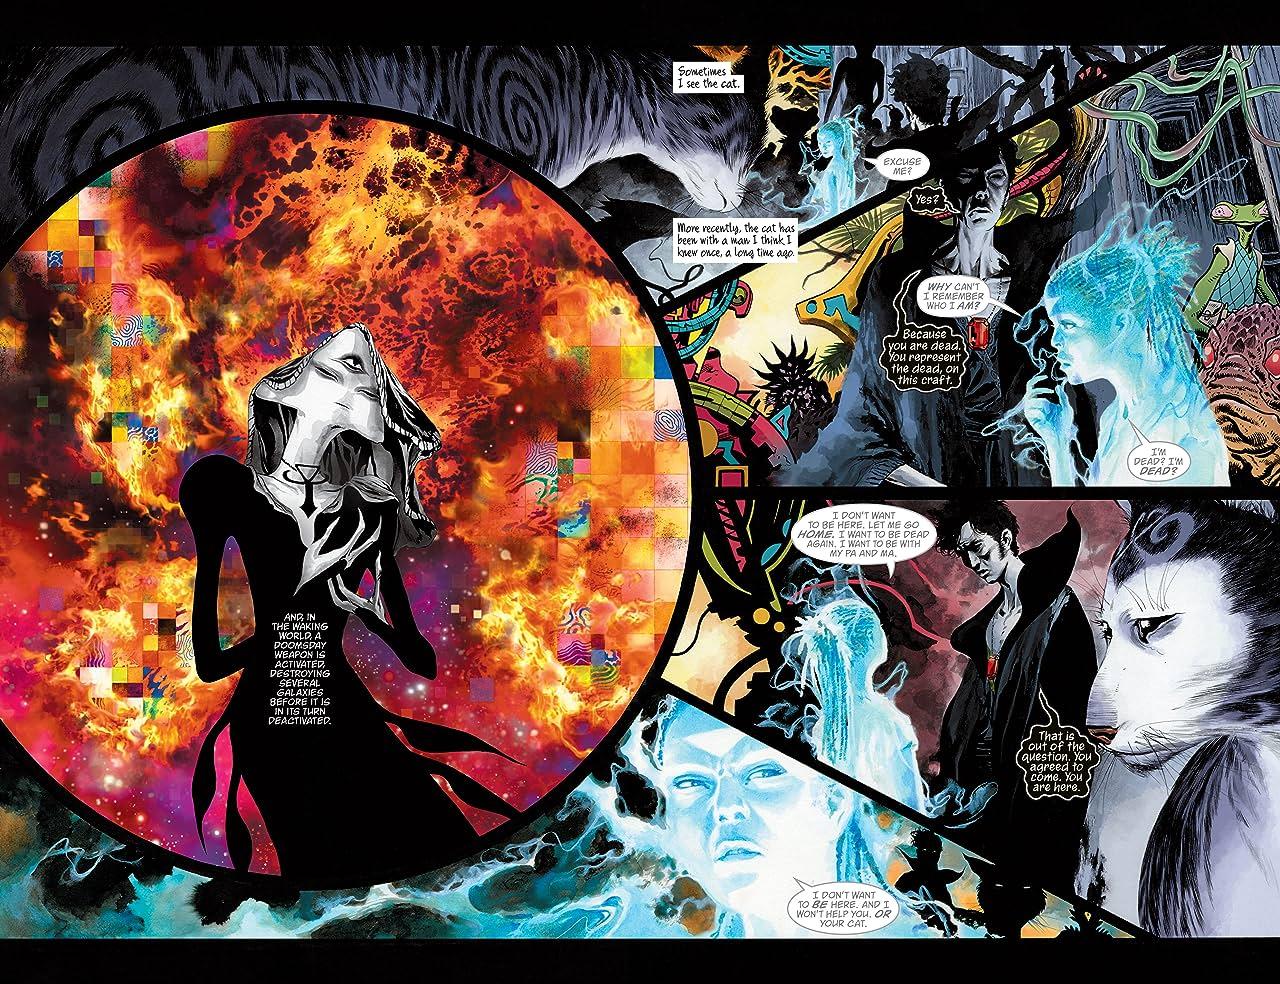 The Sandman: Overture (2013-2015) #6 (of 6)